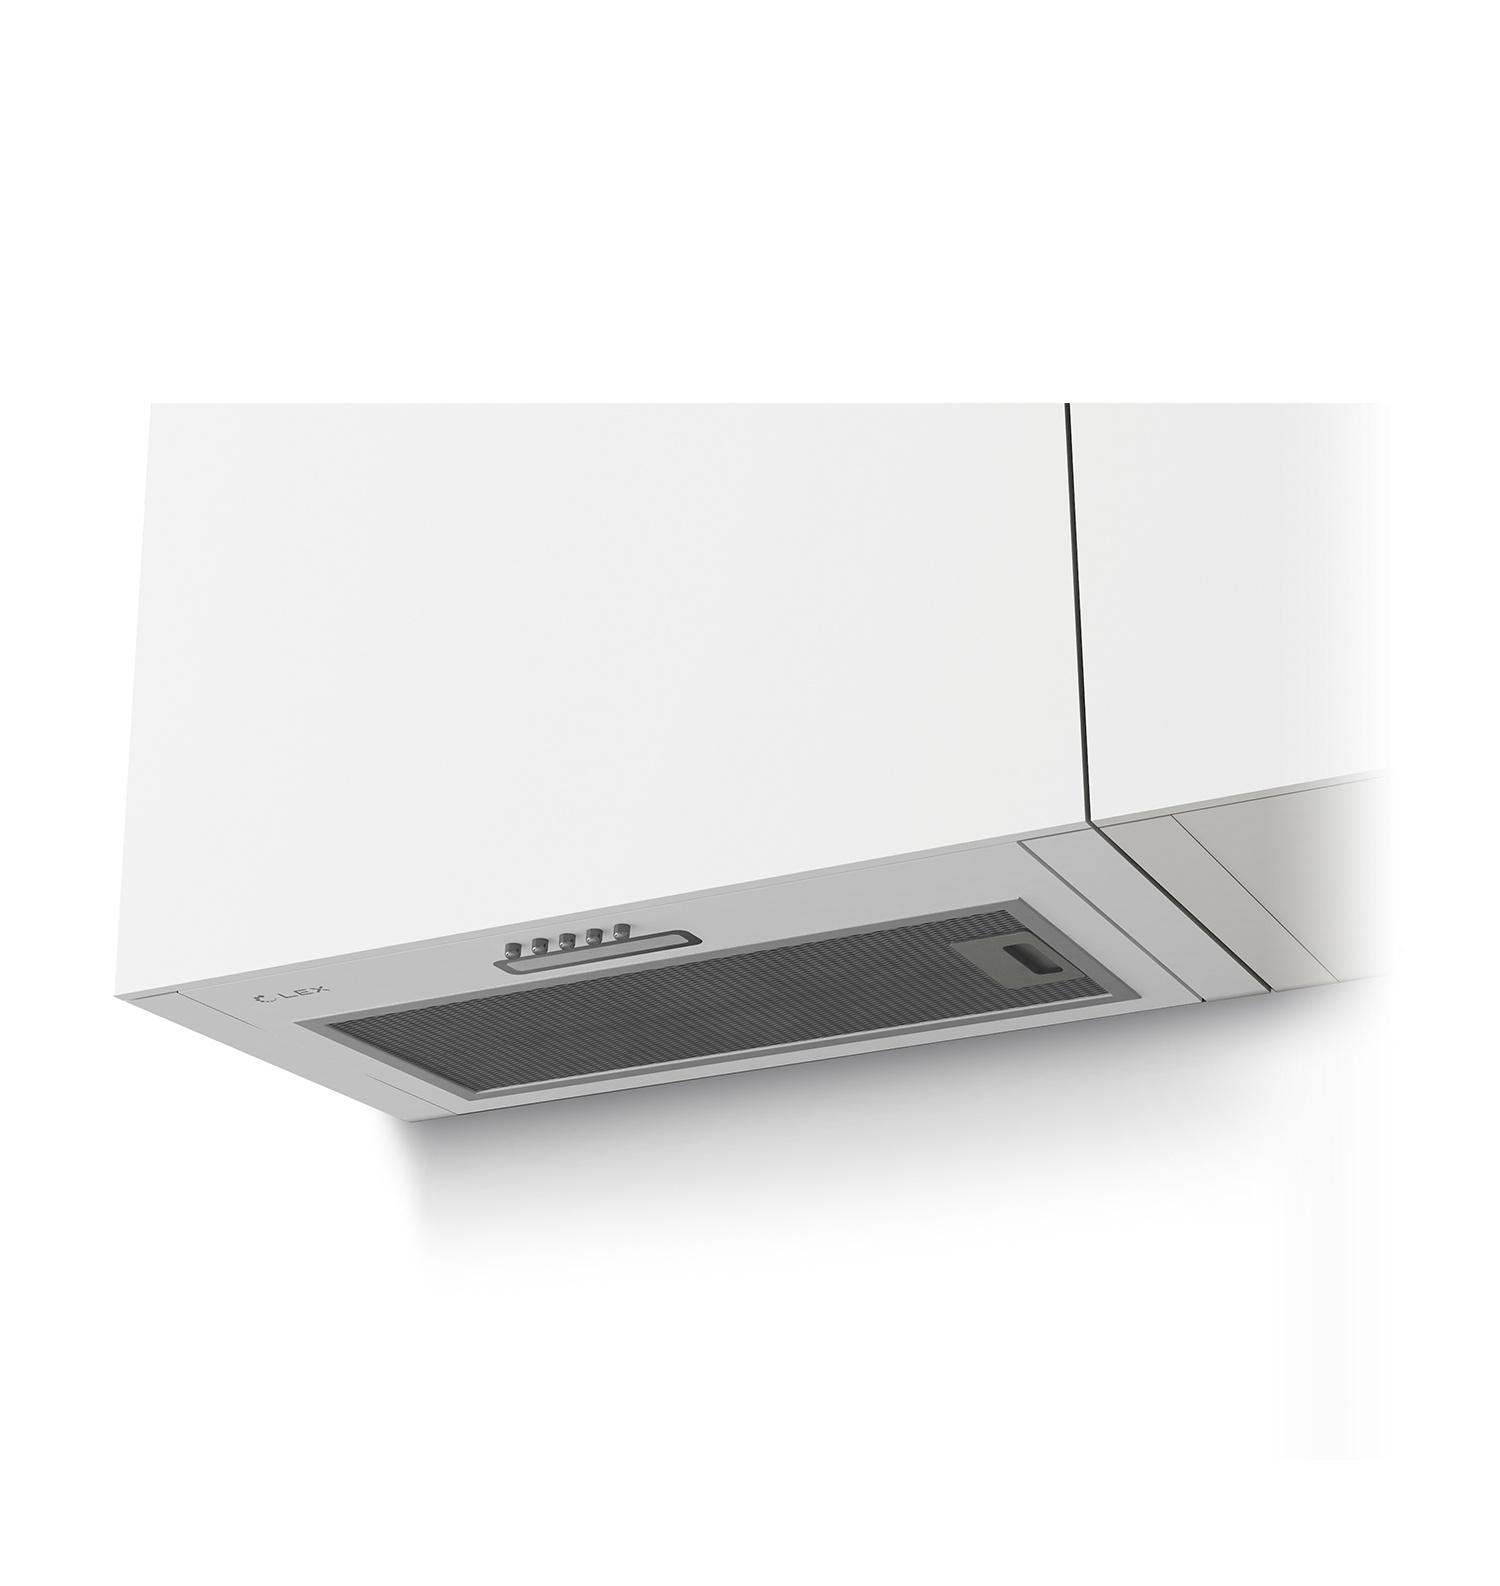 Вытяжка LEX GS Bloc Light 600 White, белый LEX